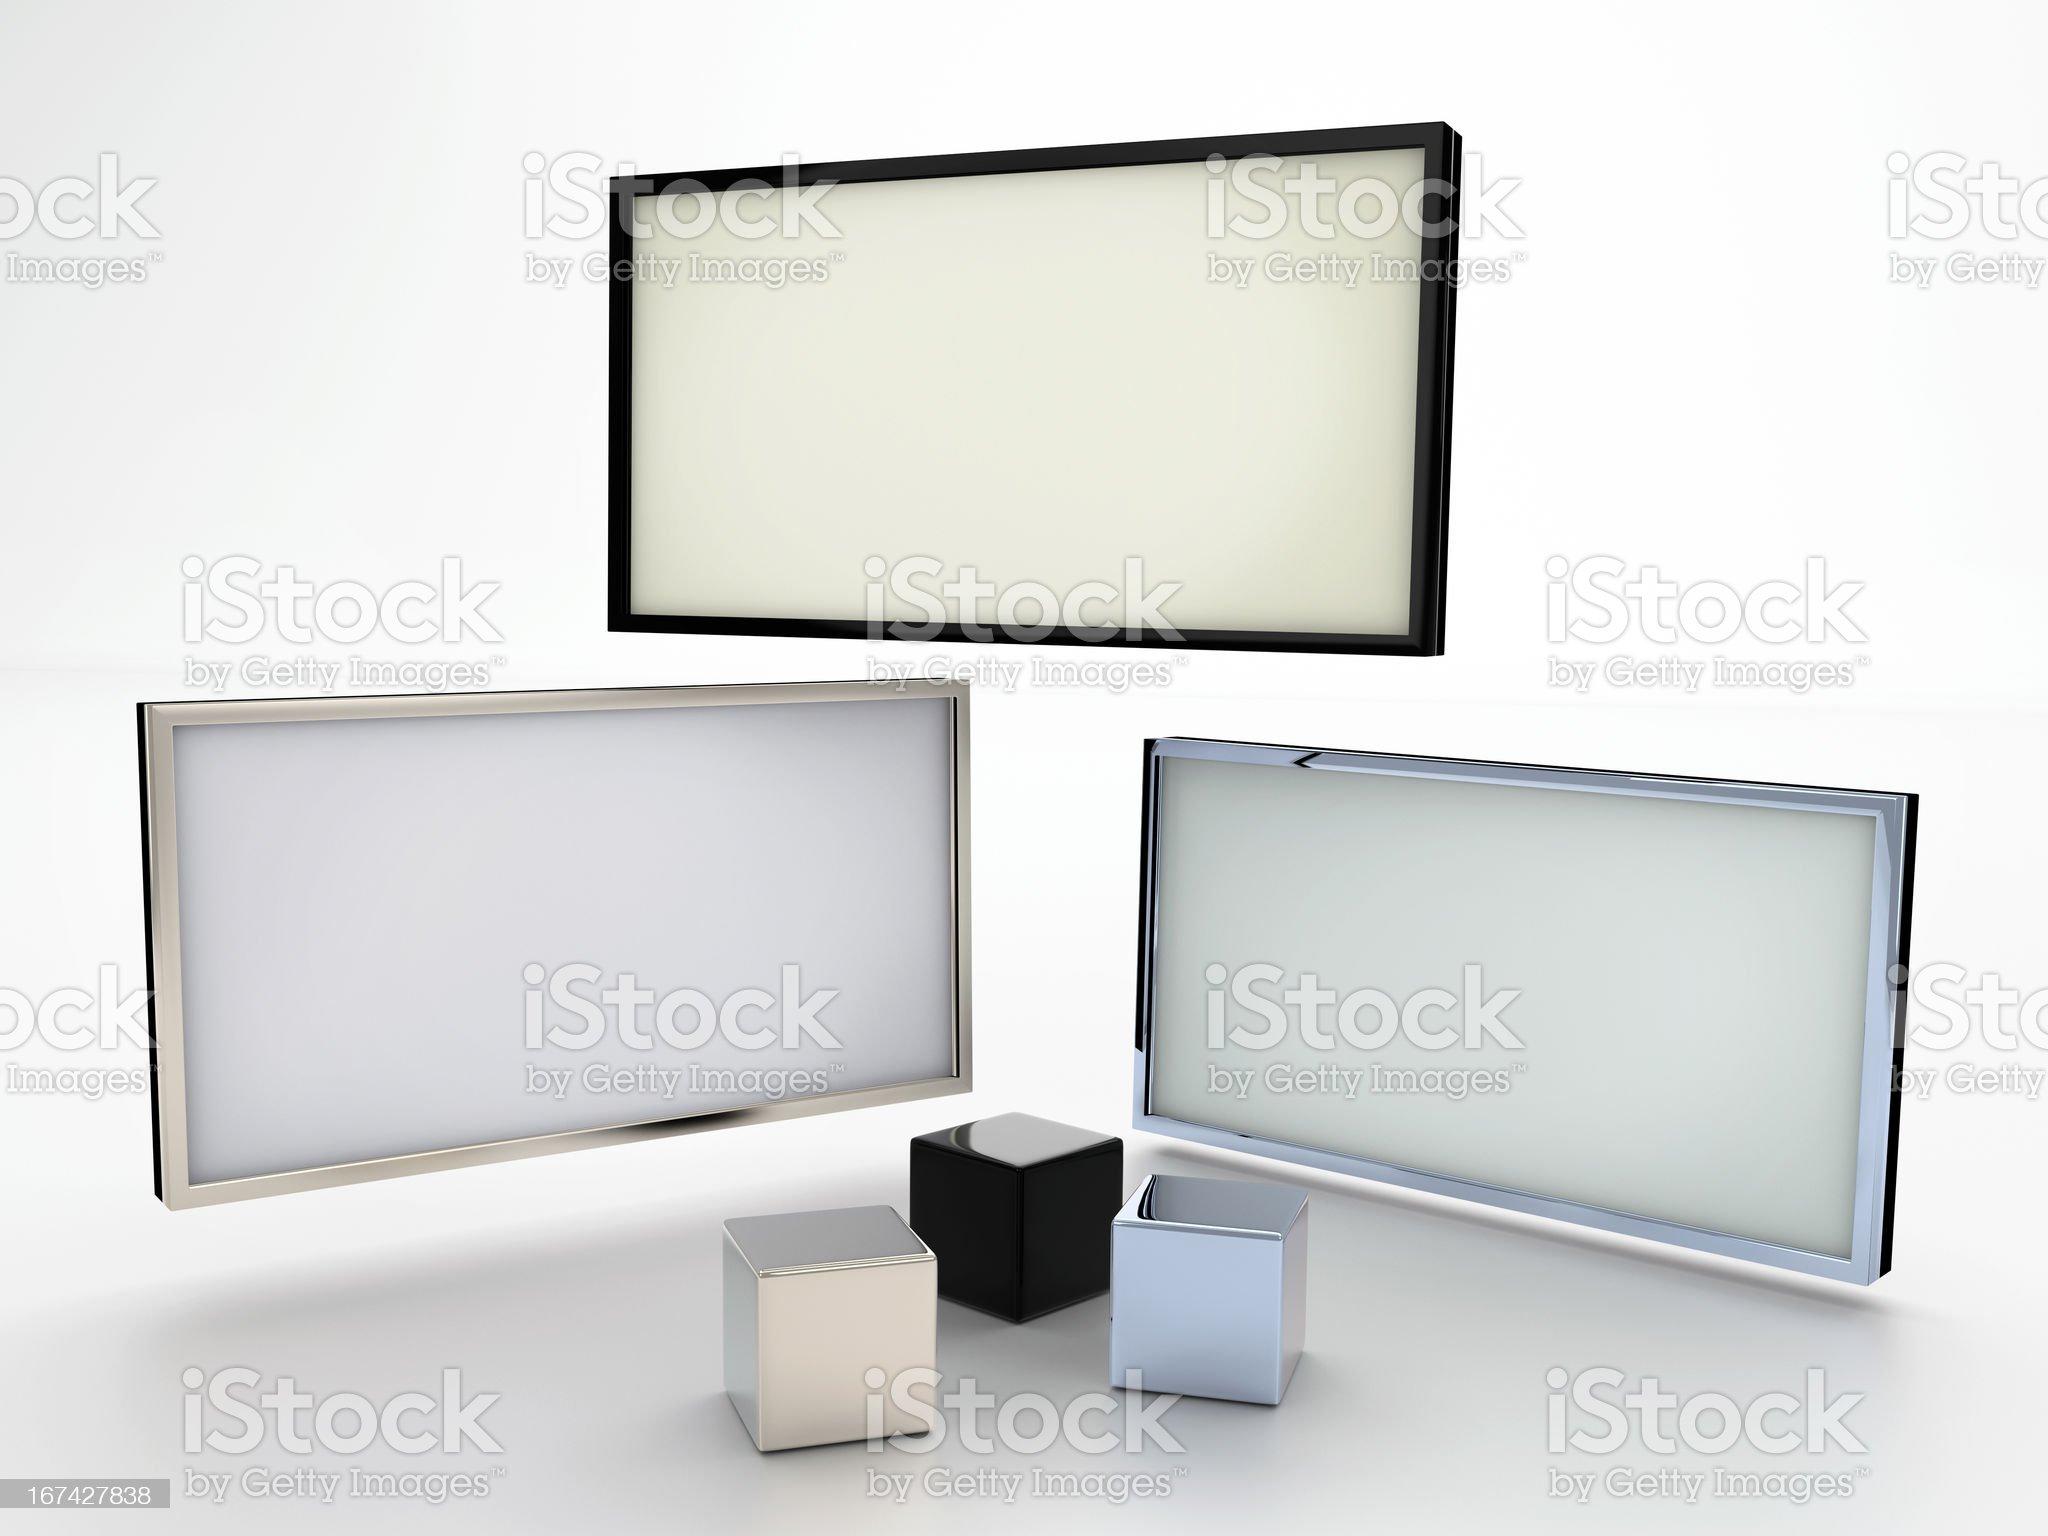 Blank displays royalty-free stock photo